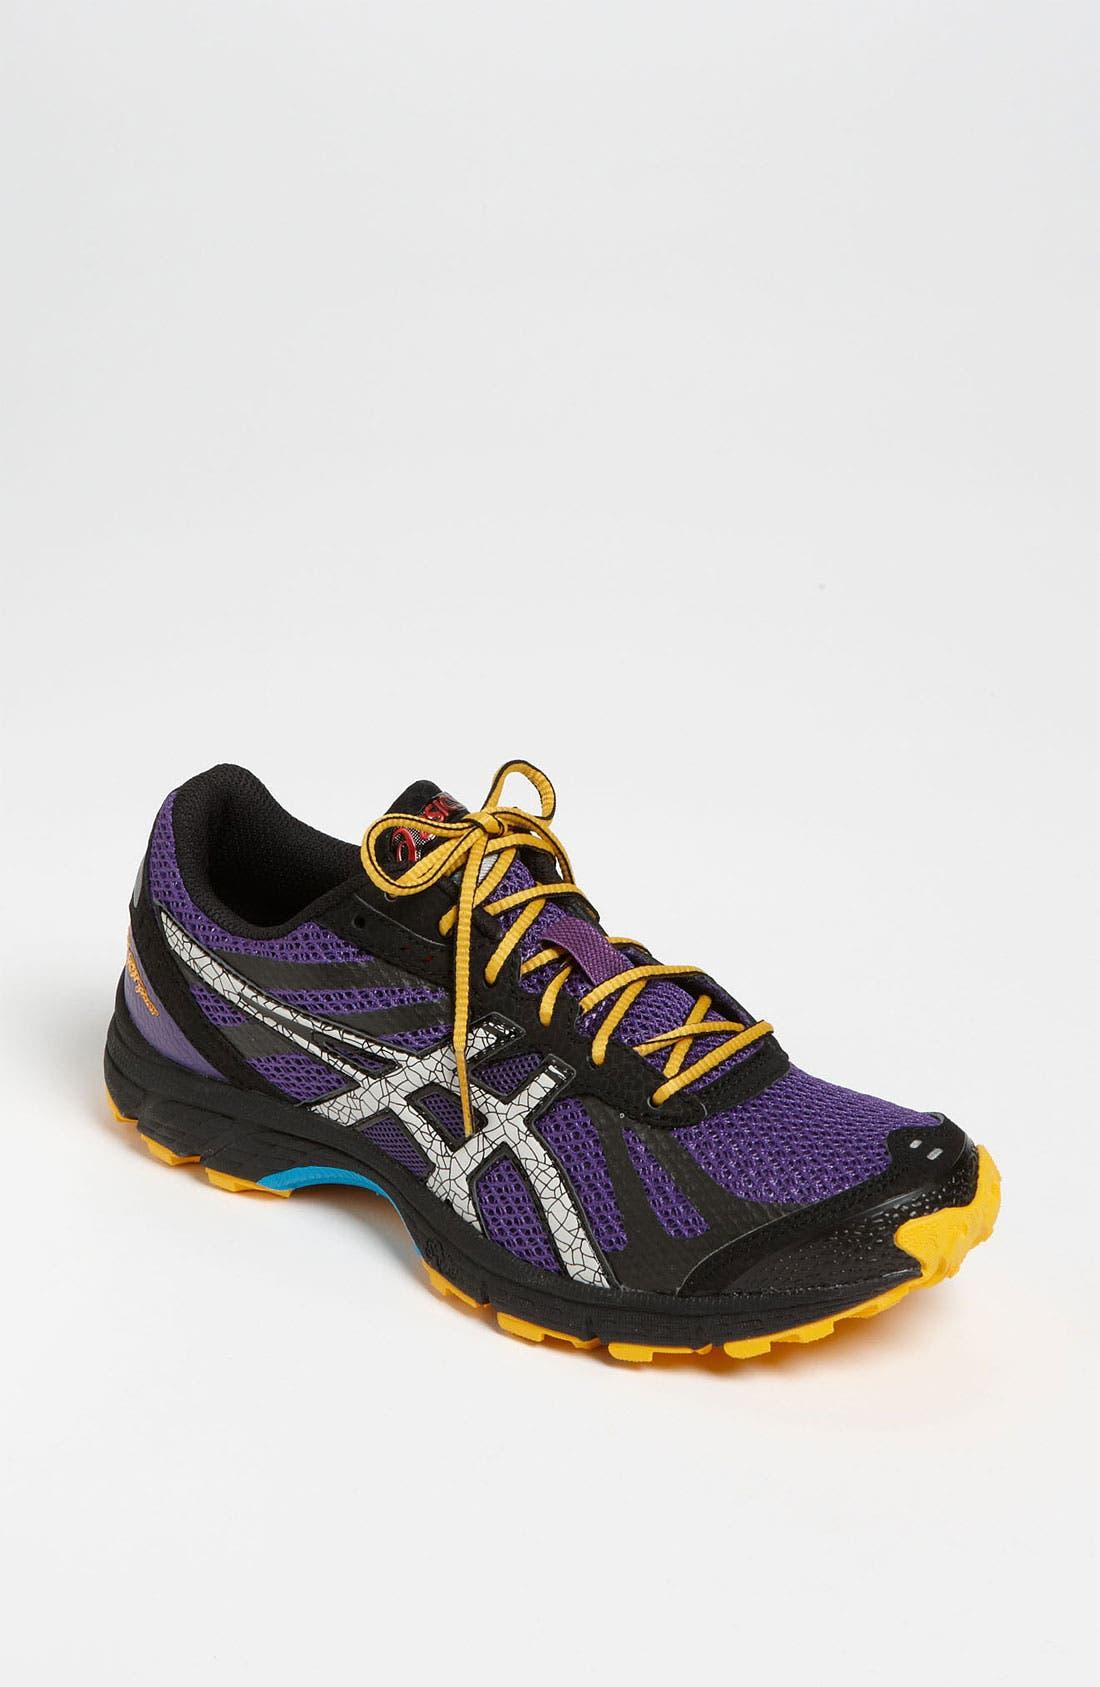 Alternate Image 1 Selected - ASICS® 'GEL-Fuji Racer' Running Shoe (Women)